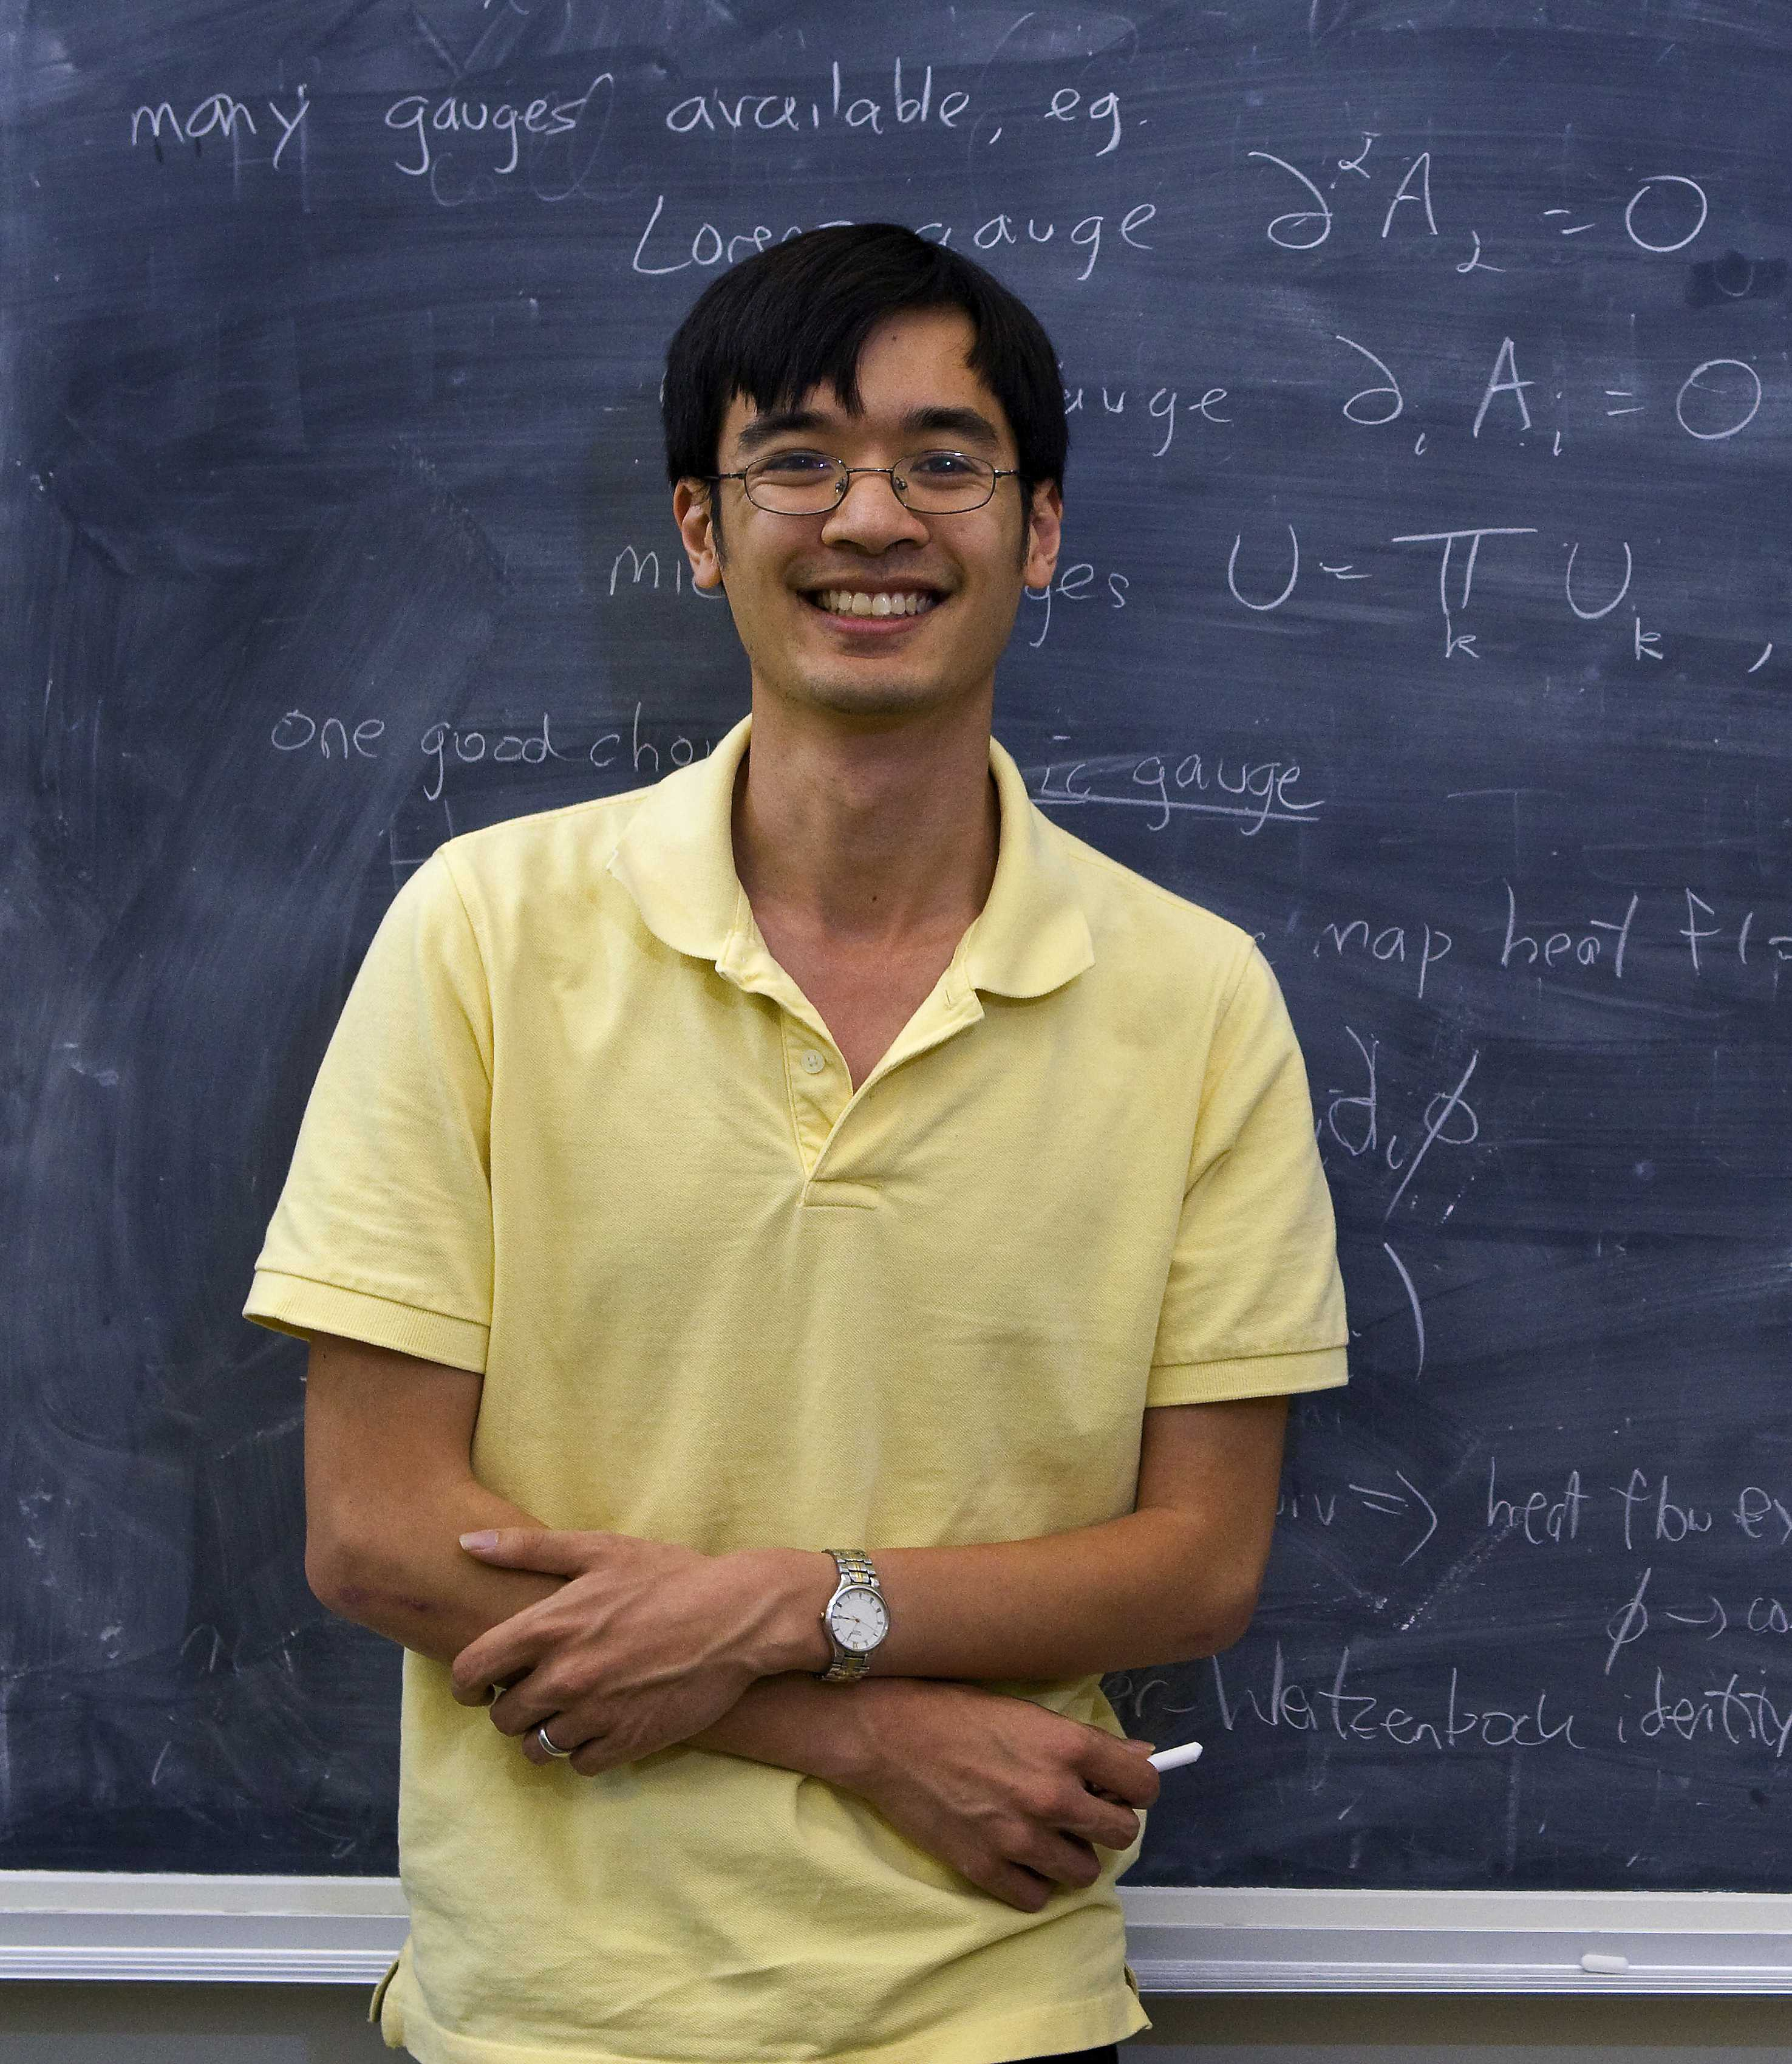 1. Terence Tao